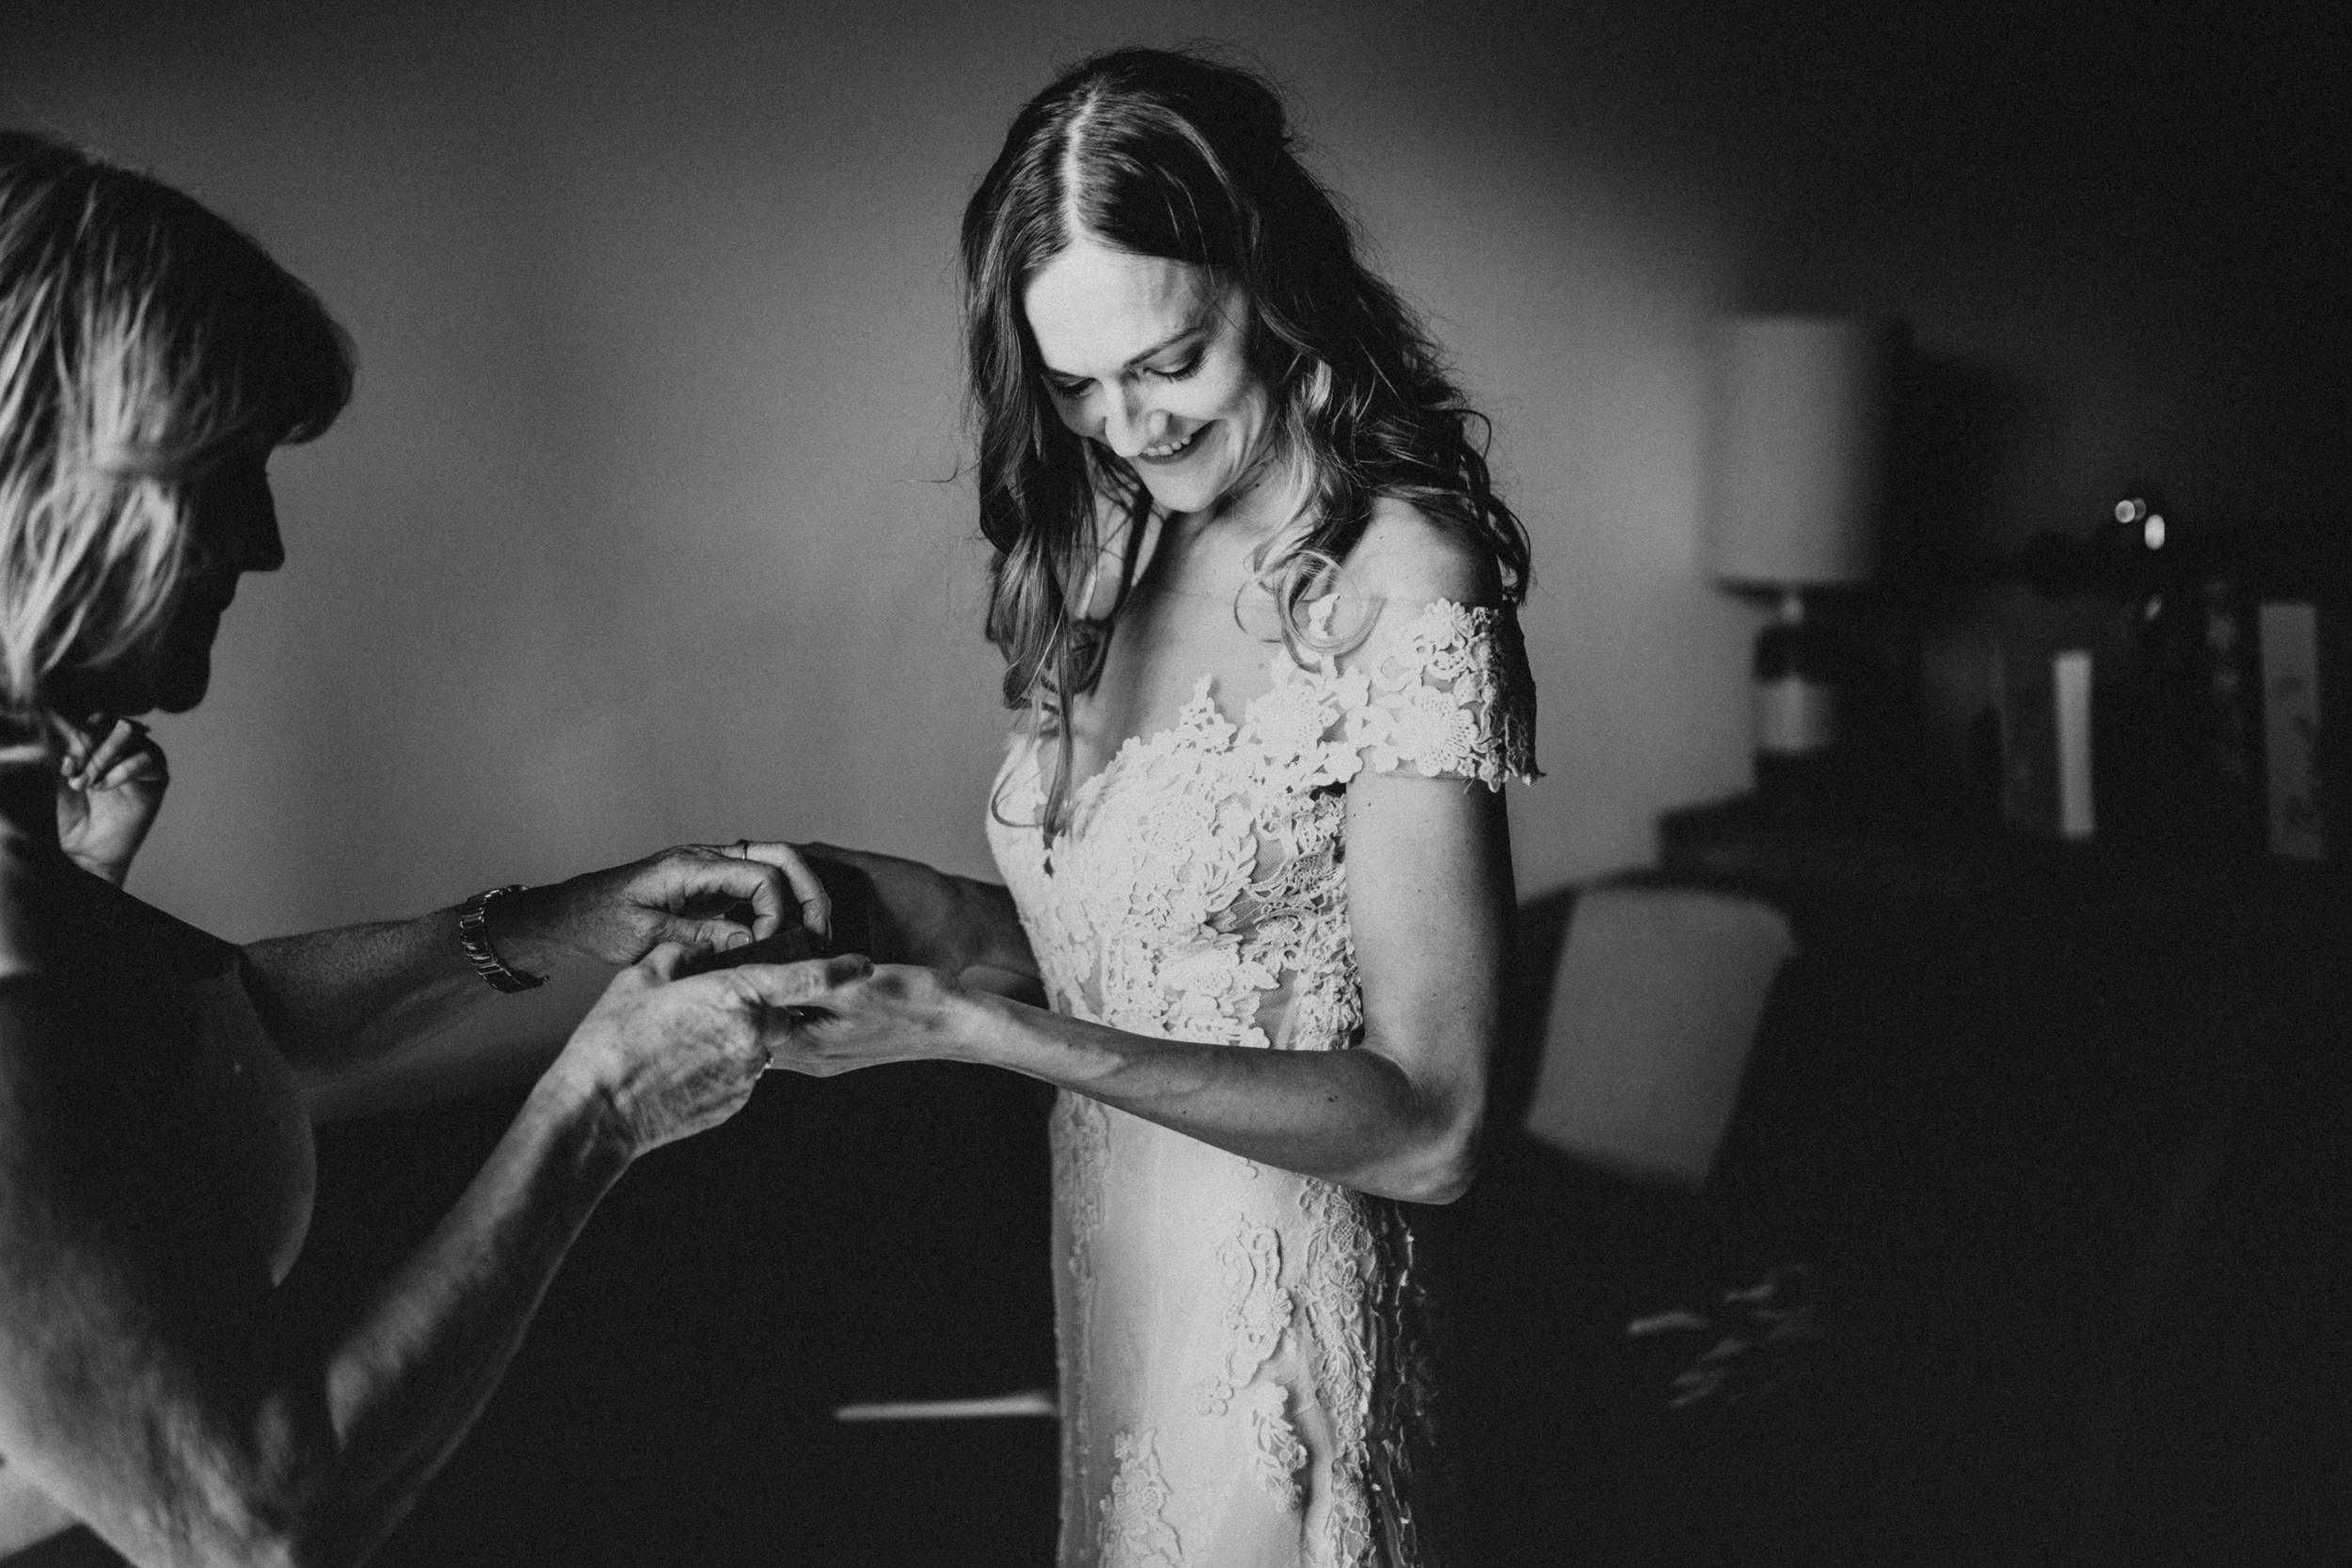 Laura-Benn-The-Asylum-London-The-Ace-Hotel-Wedding-Alternative-Darina-Stoda-Photography-49.jpg